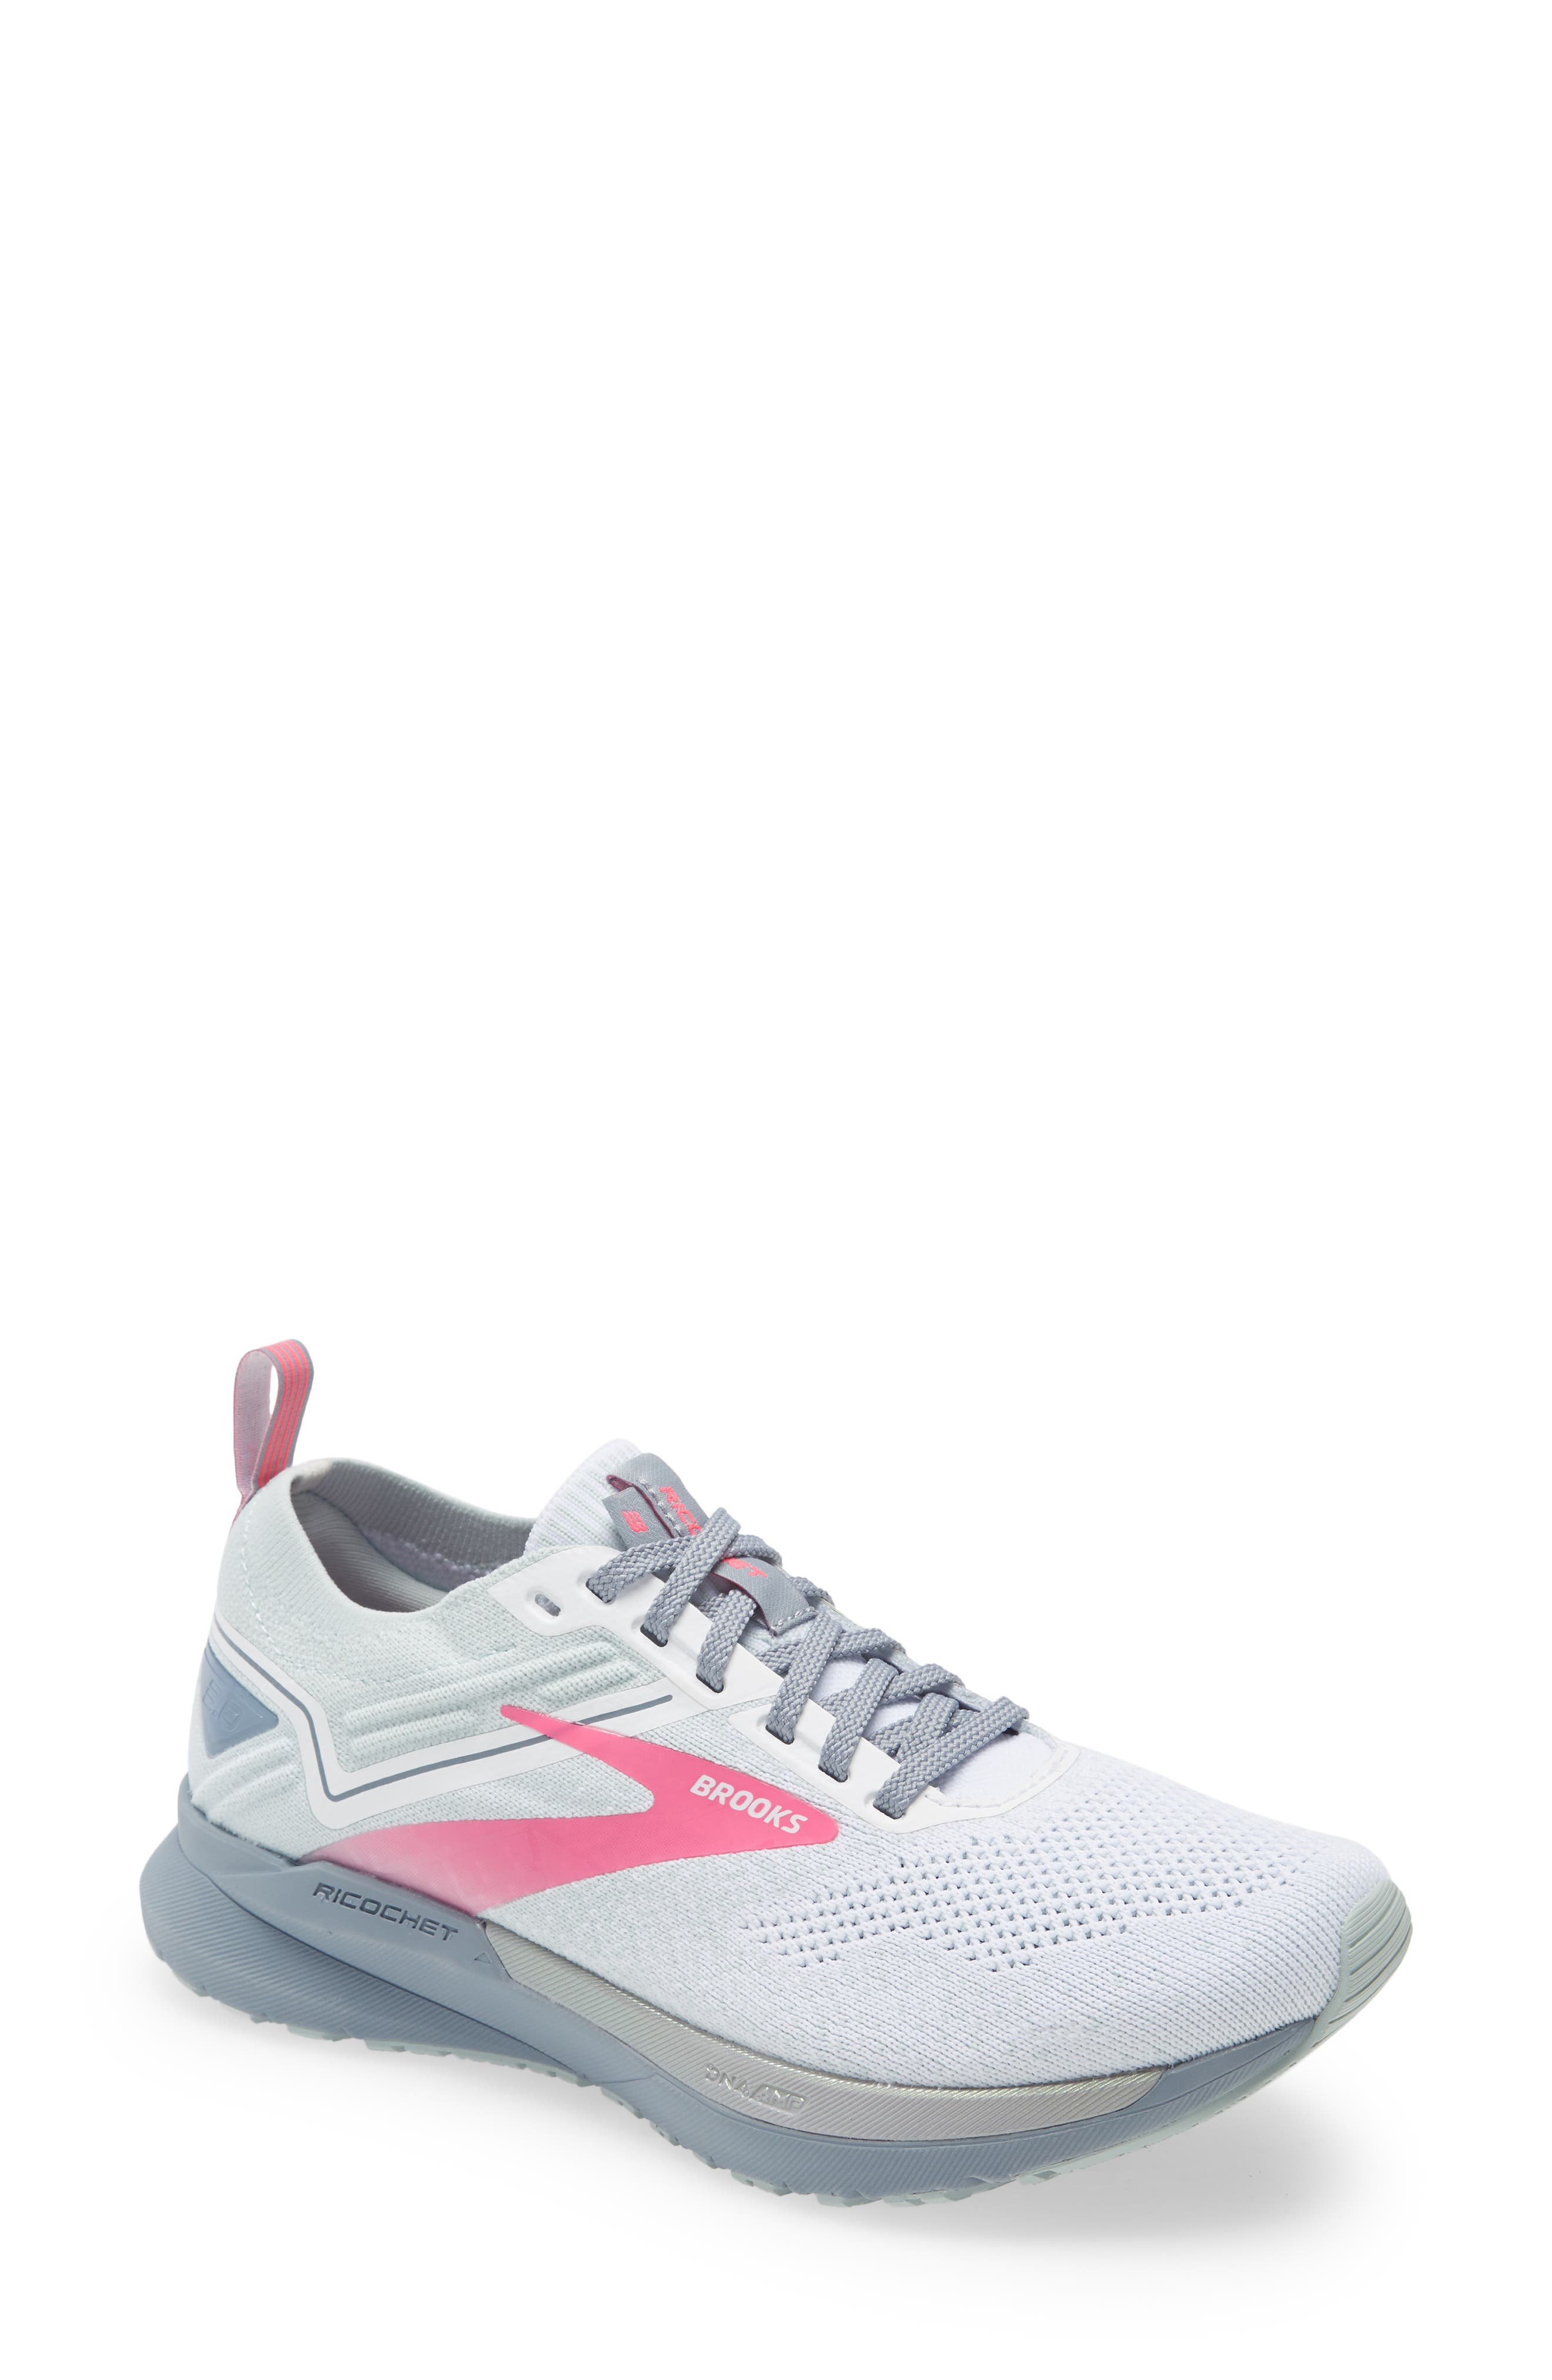 Ricochet 3 Running Shoe